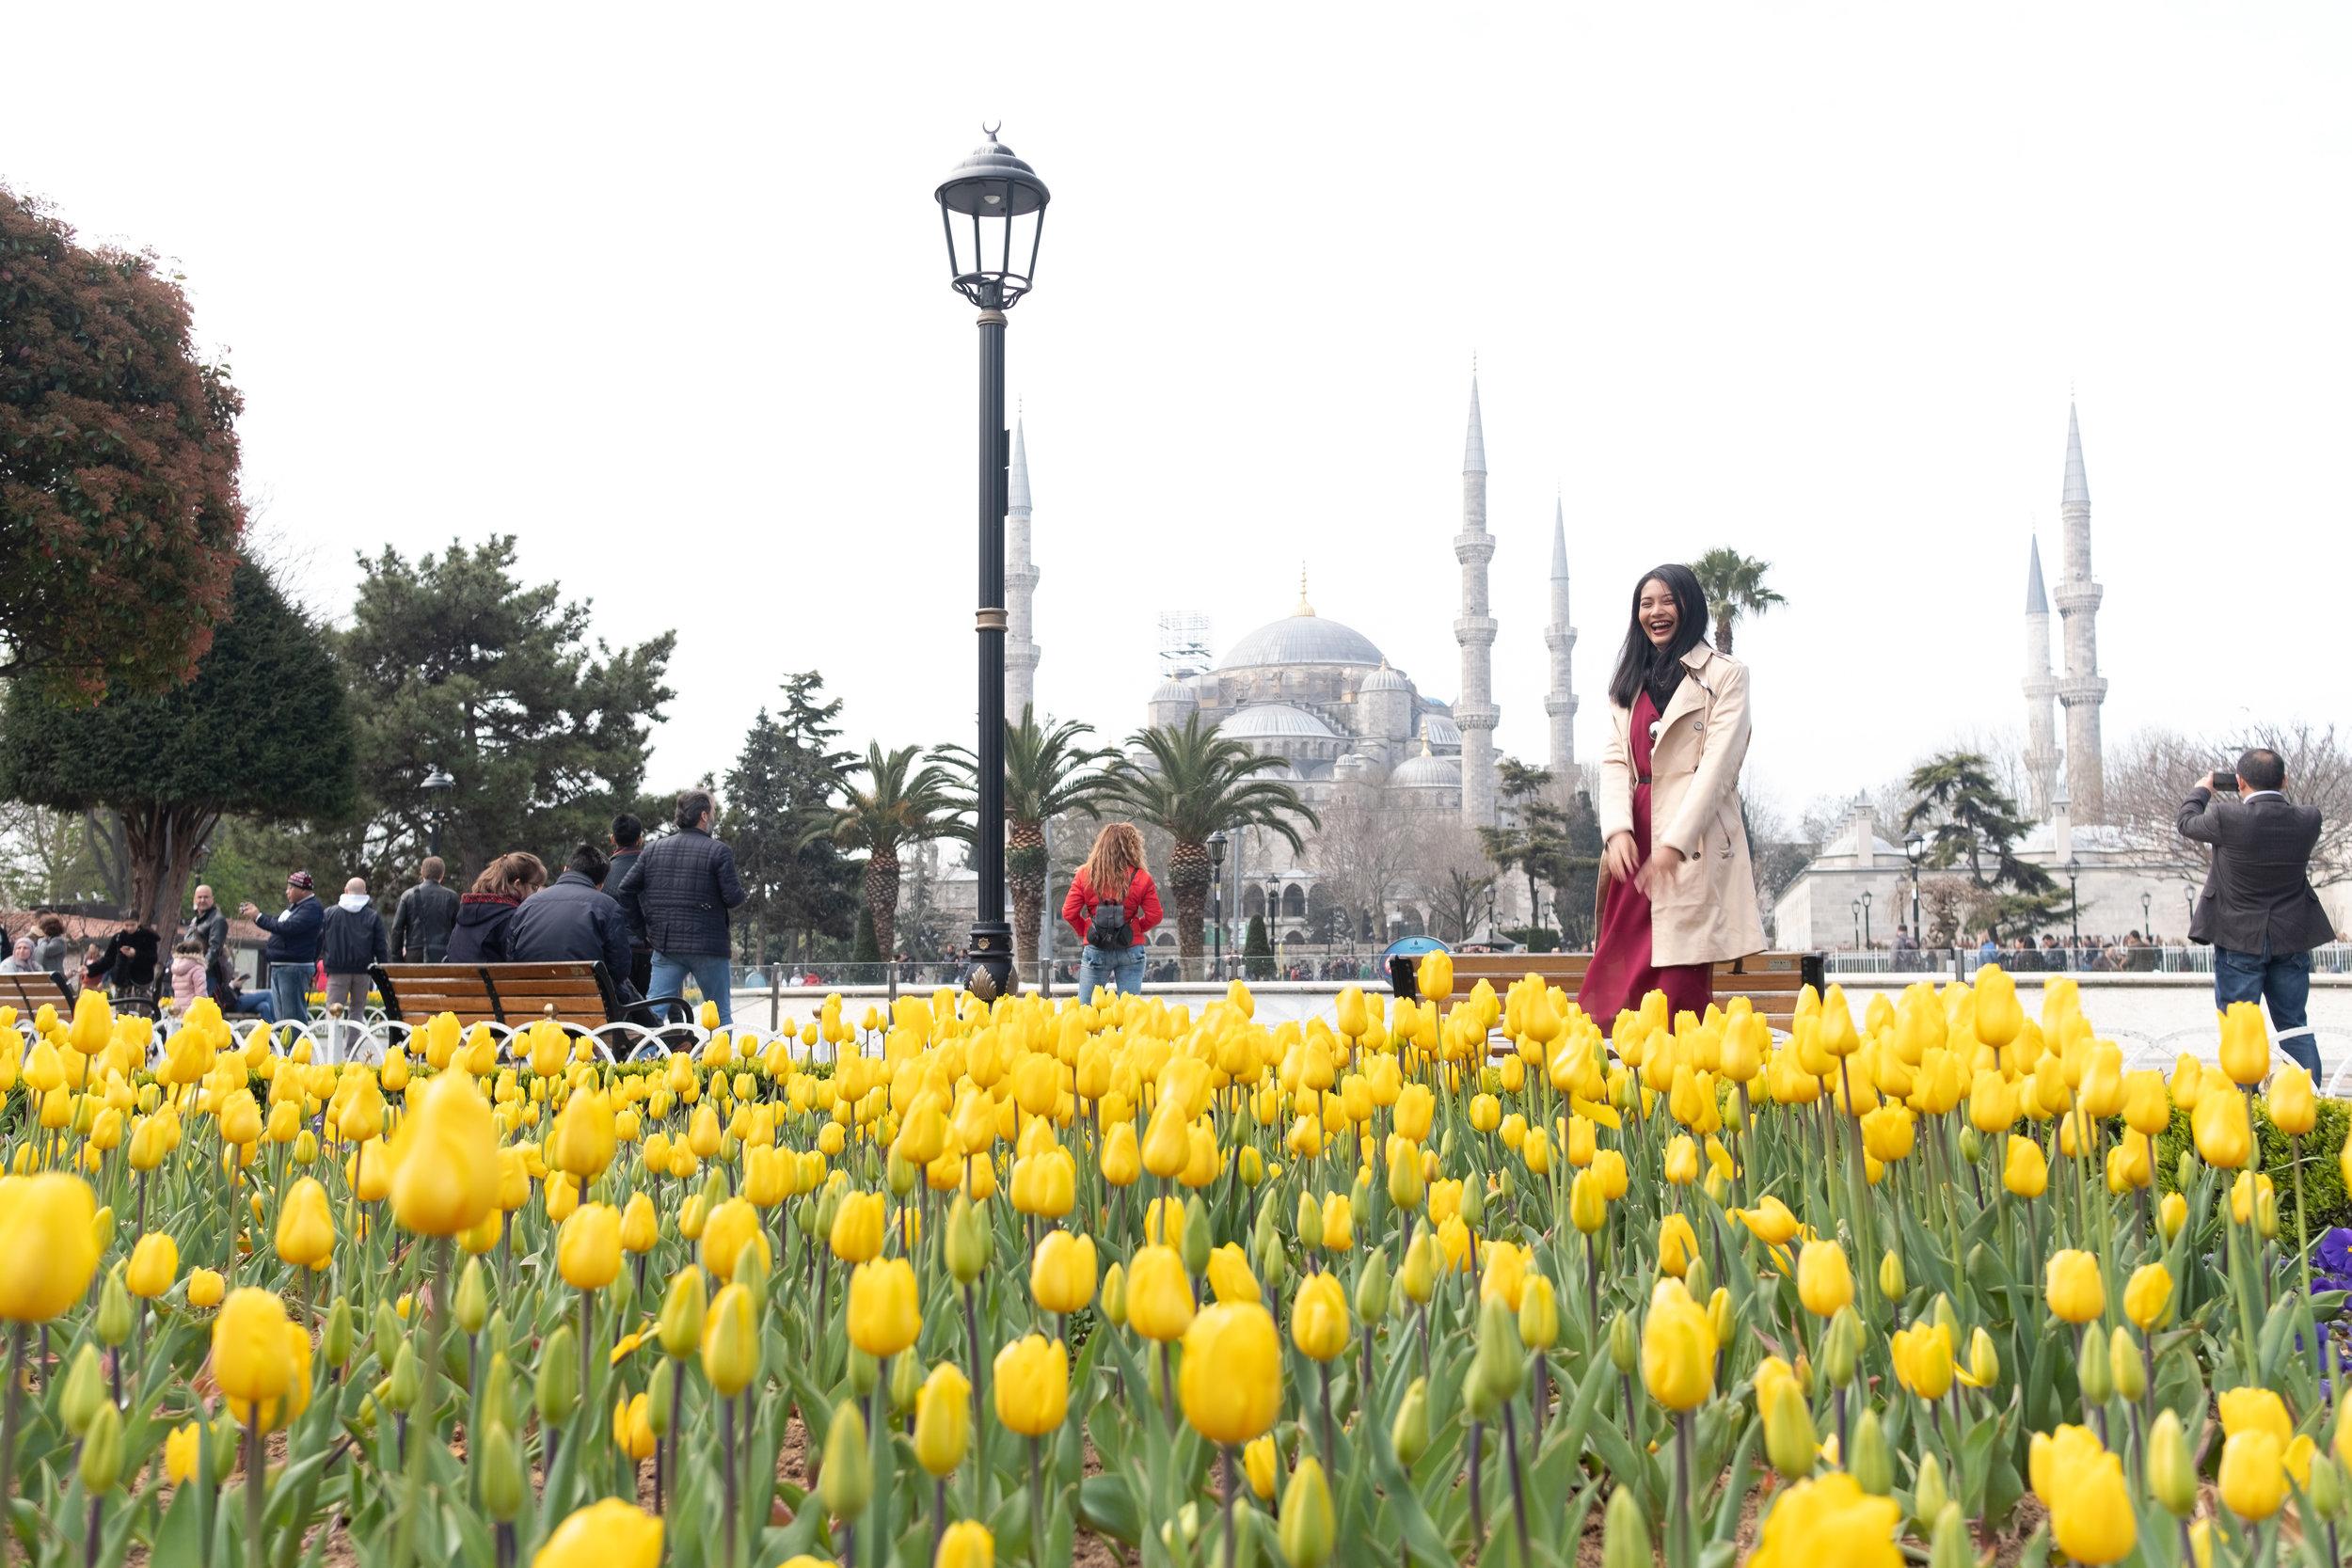 20190407 - Turkey - 0808.JPG